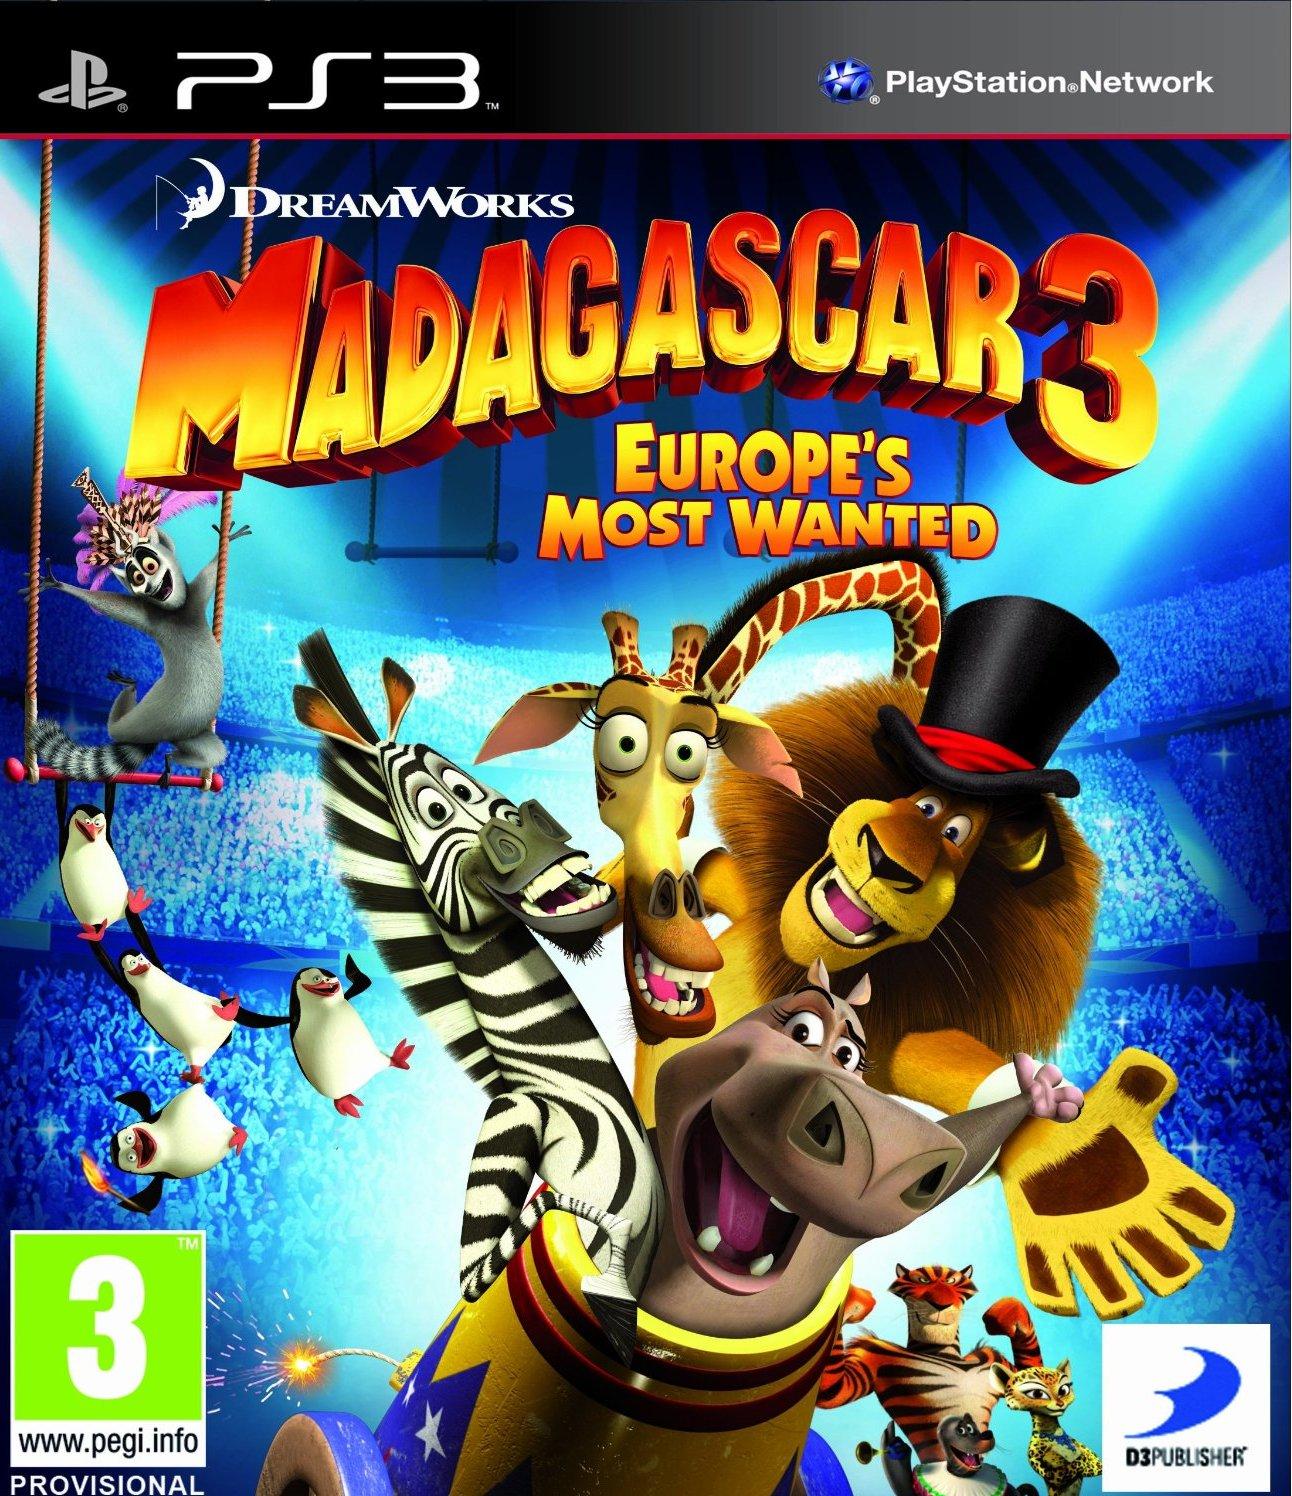 Madagascar 3 full movie game - Chandu movie songs free download